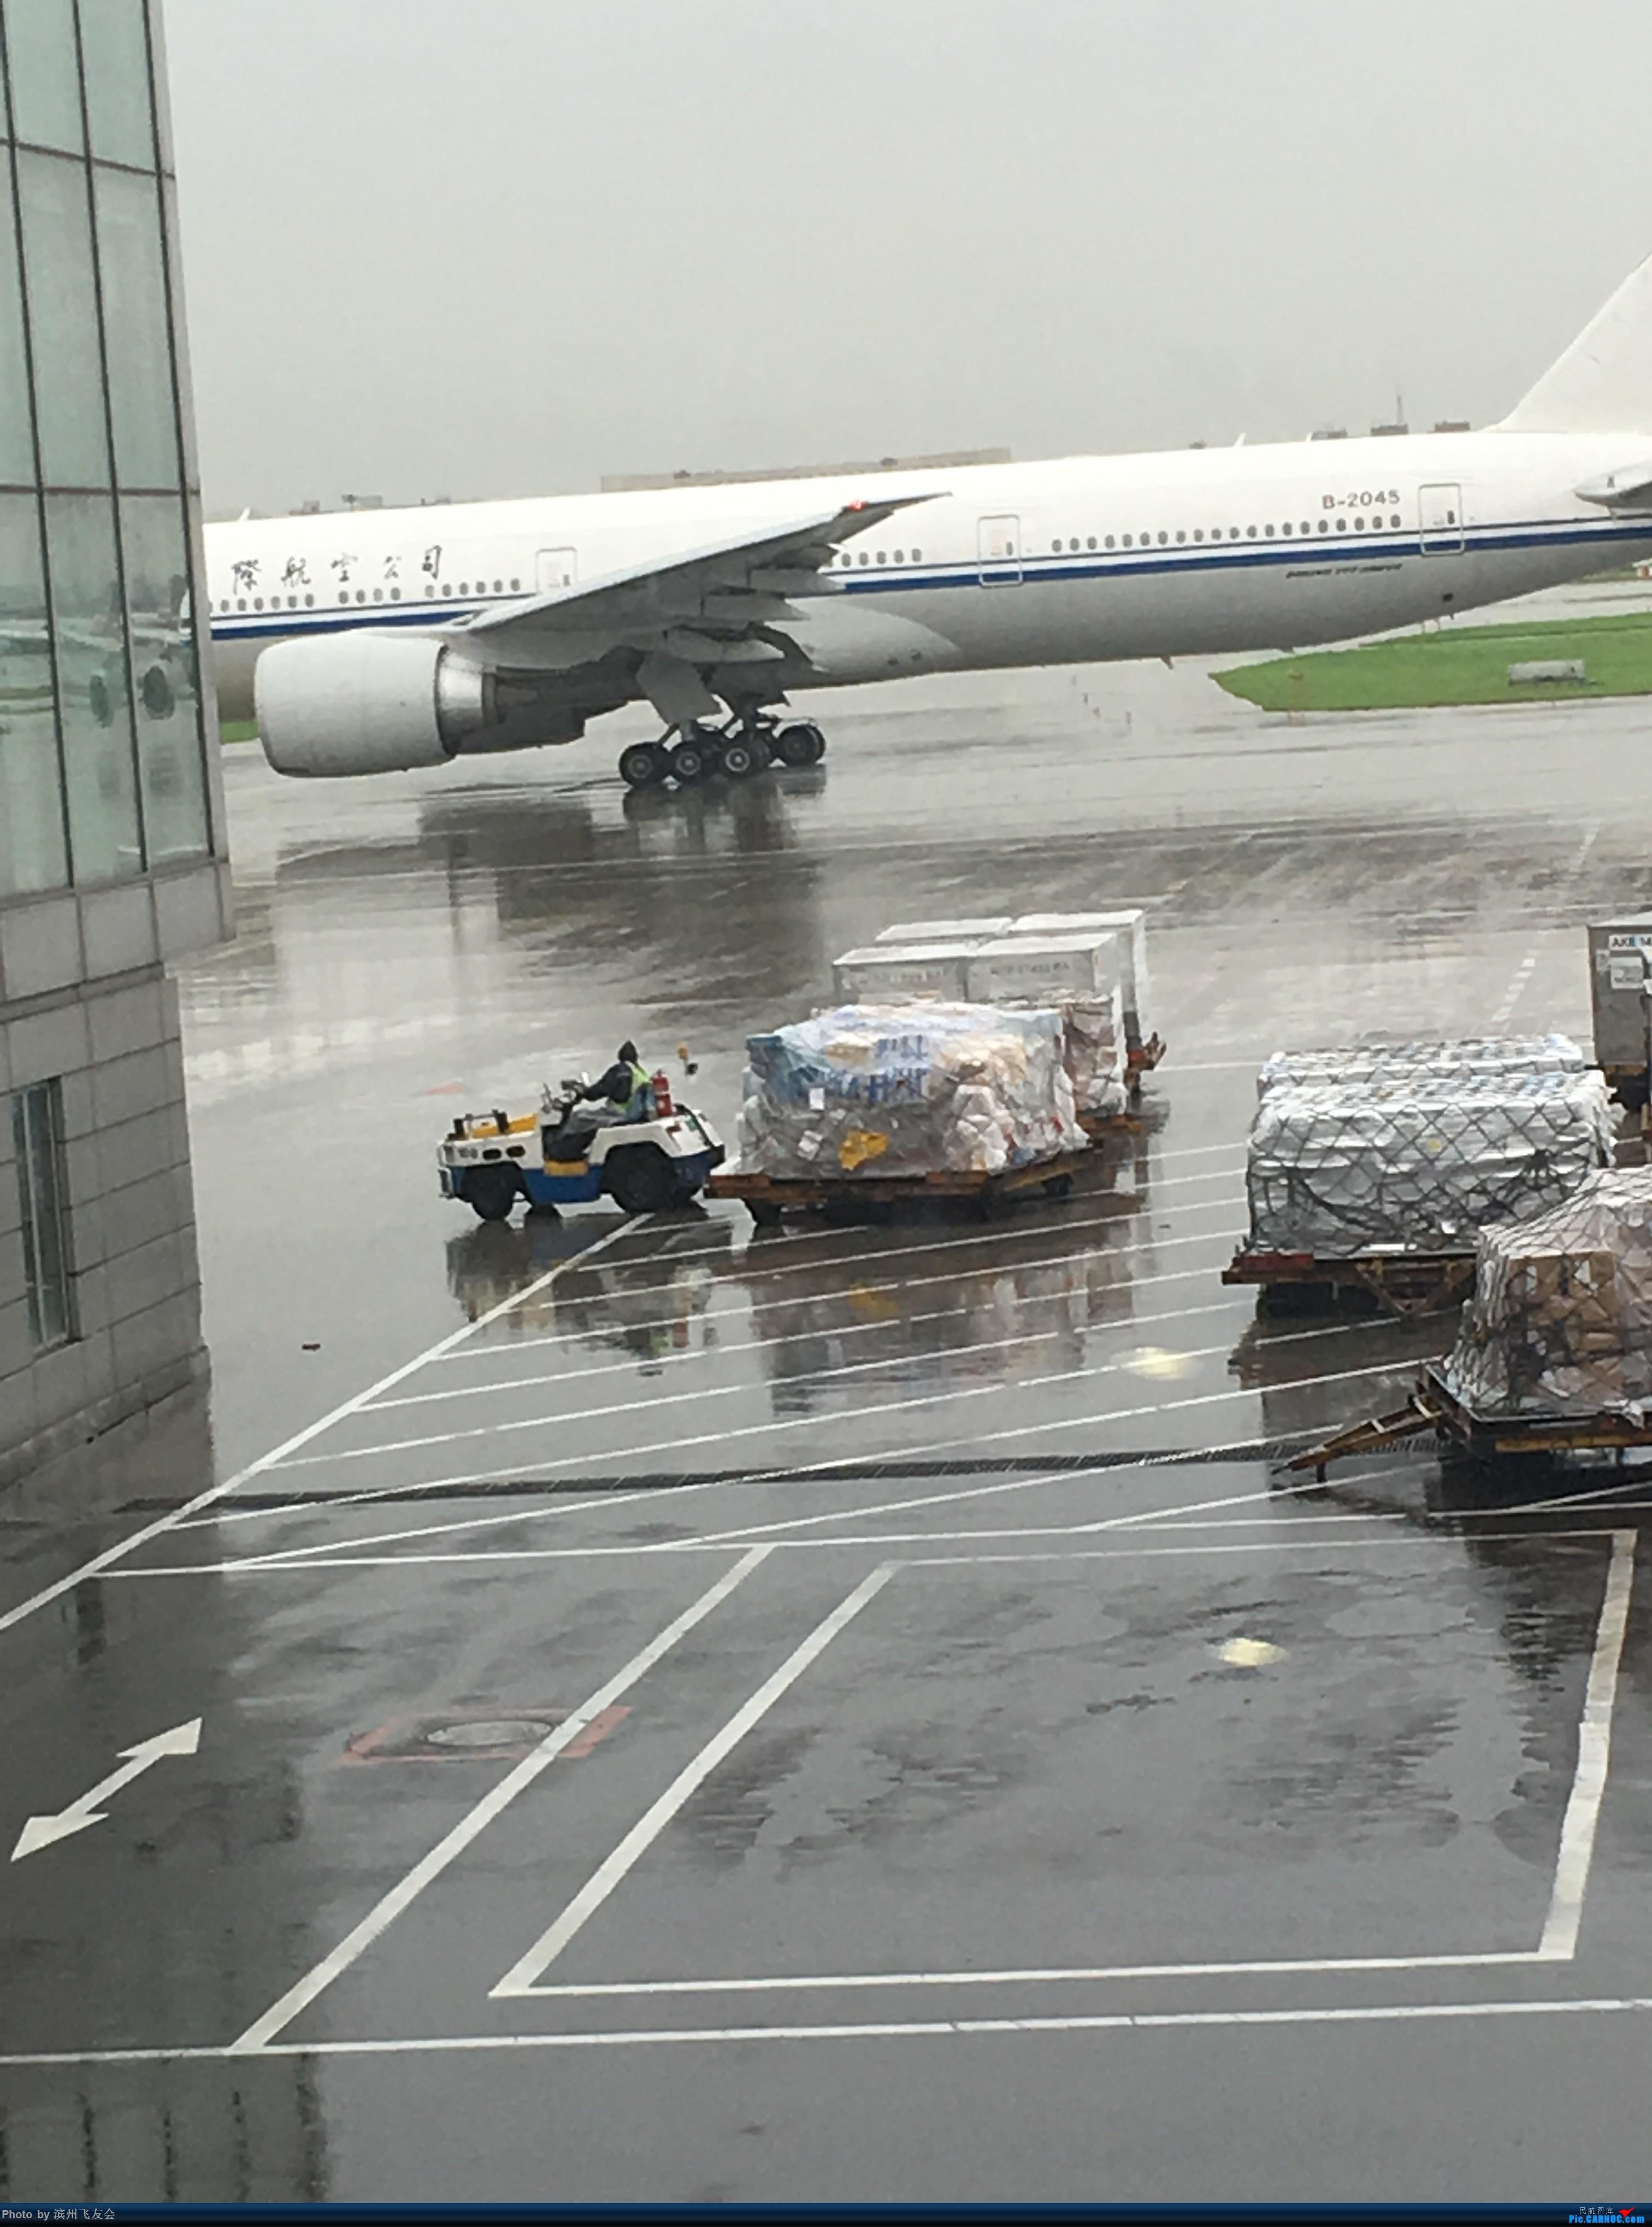 Re:[原创]~骚年飞行篇~补充半年前的香港之路,国航CA111 PEK-HKG,有幸坐到大擦第50架77W BOEING 777-300ER B-2045 中国北京首都国际机场